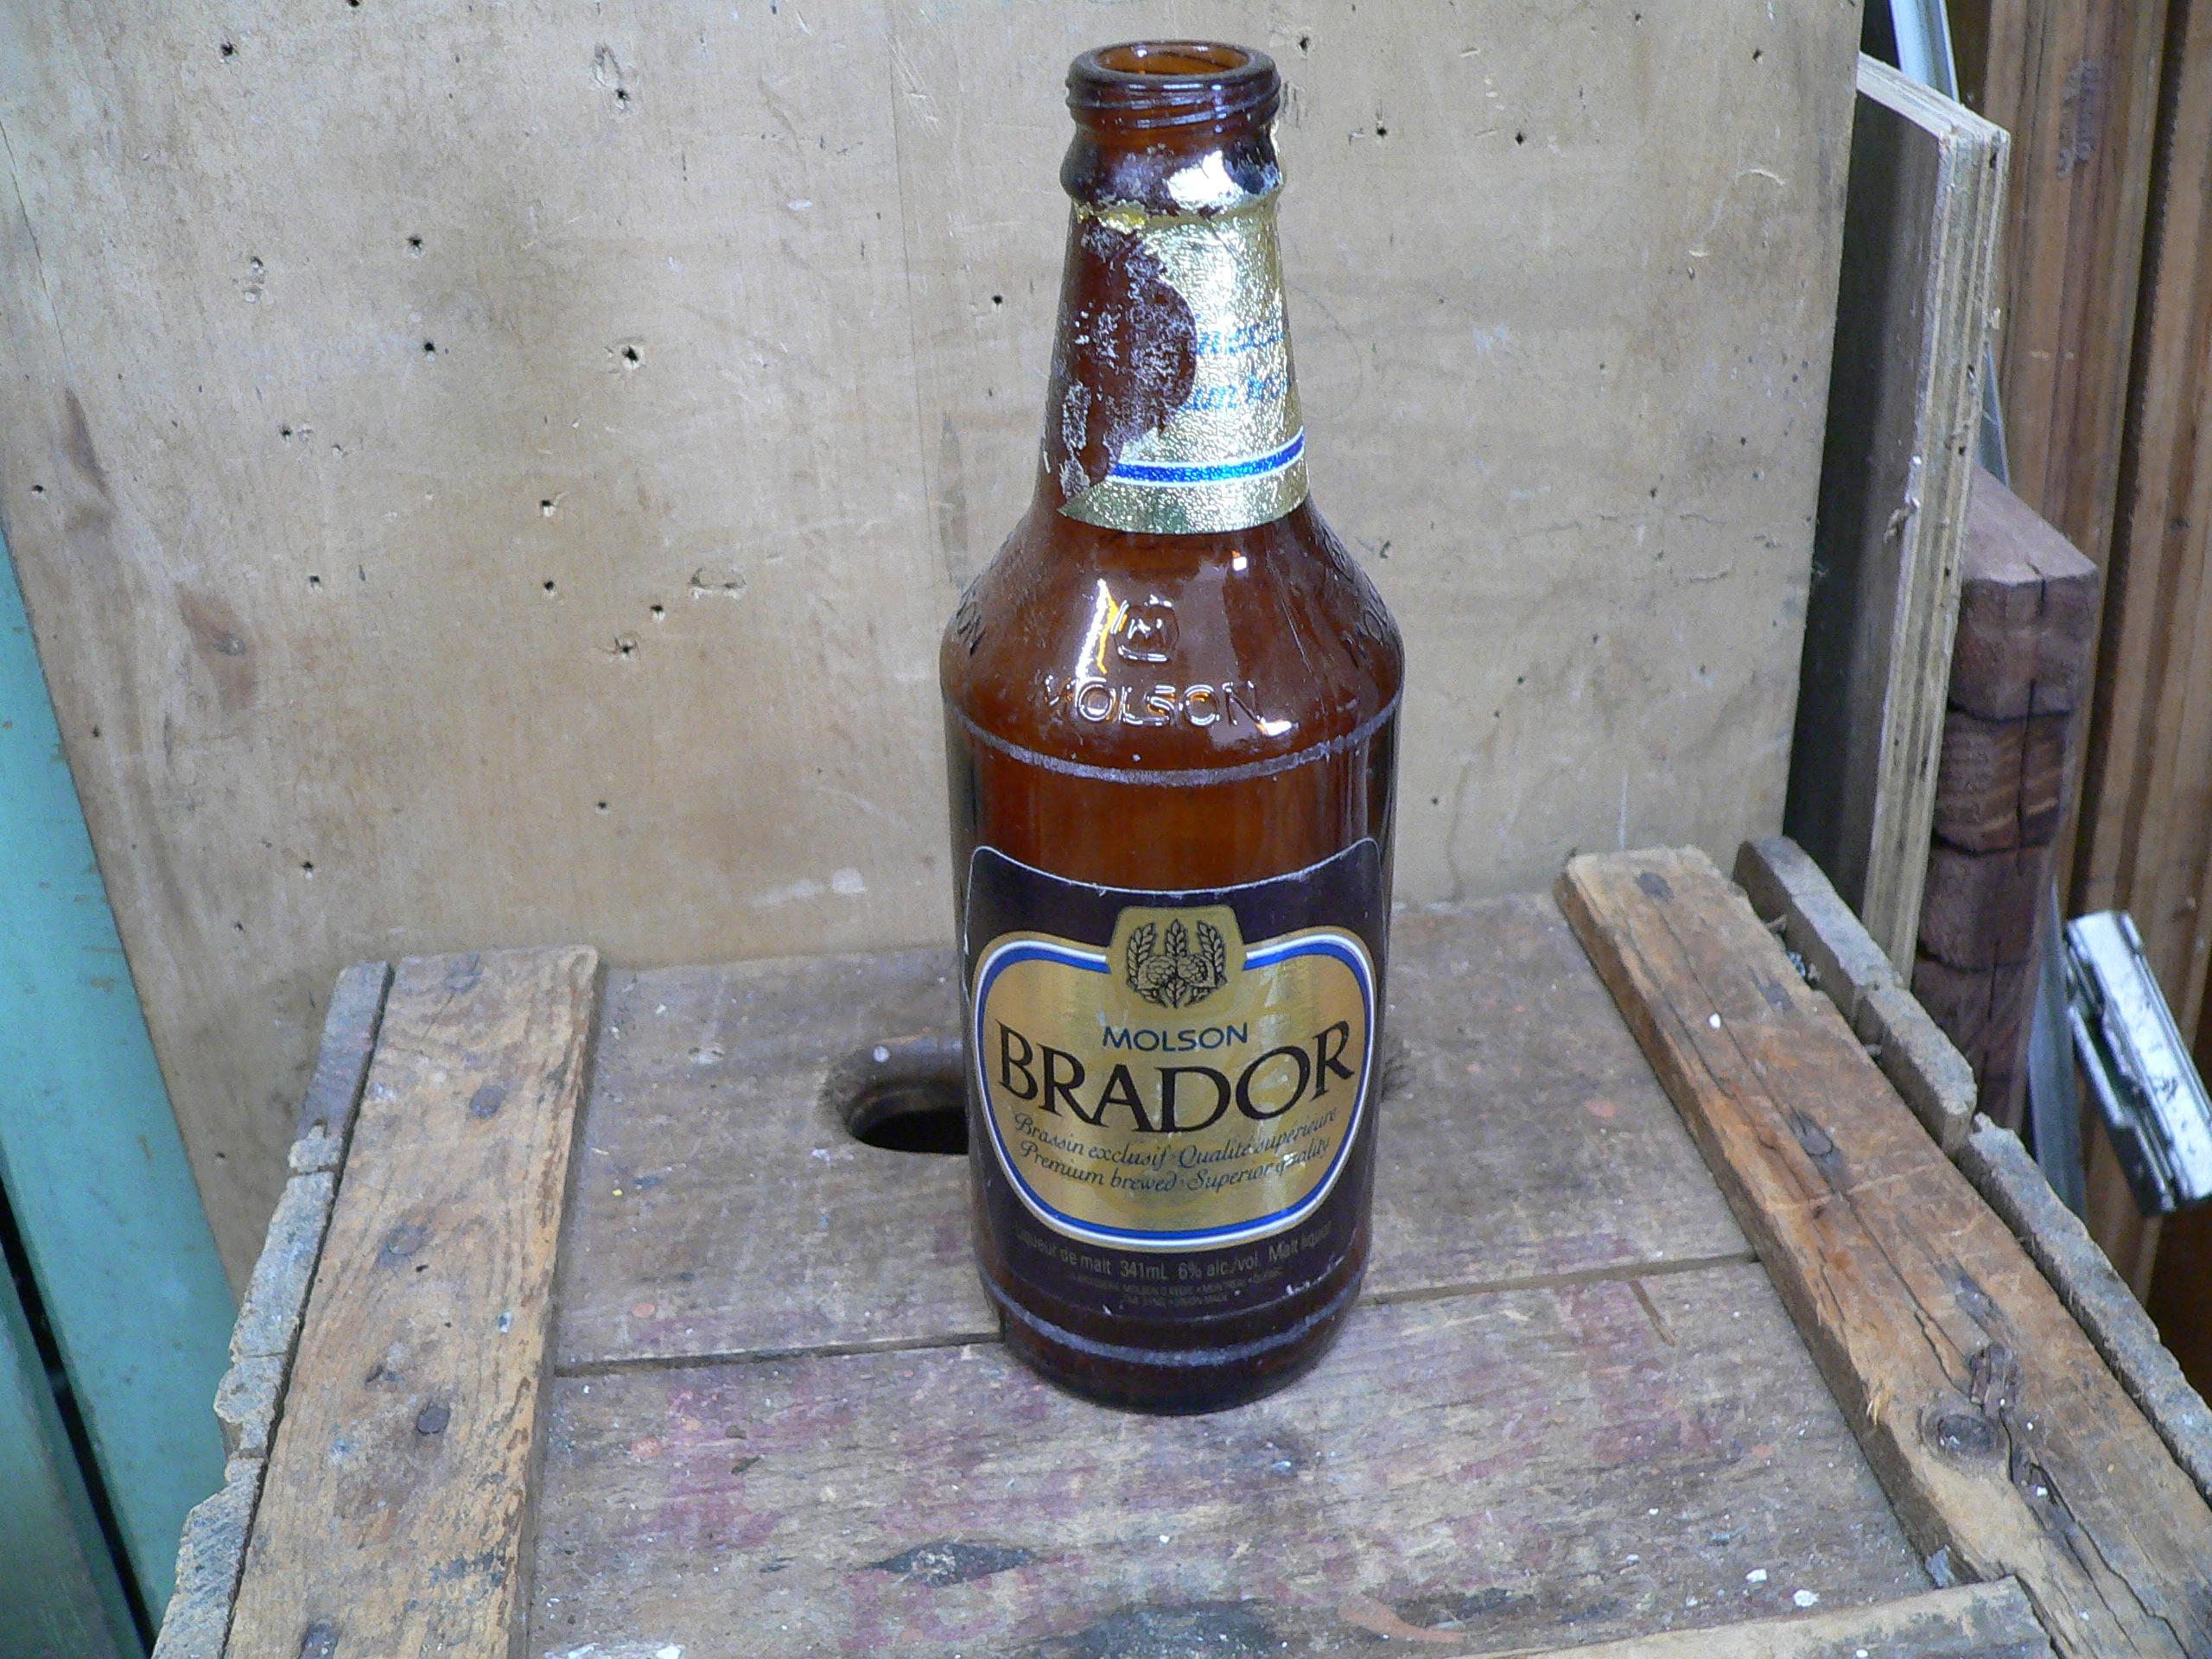 Bouteille bière molson brador # 6040.9